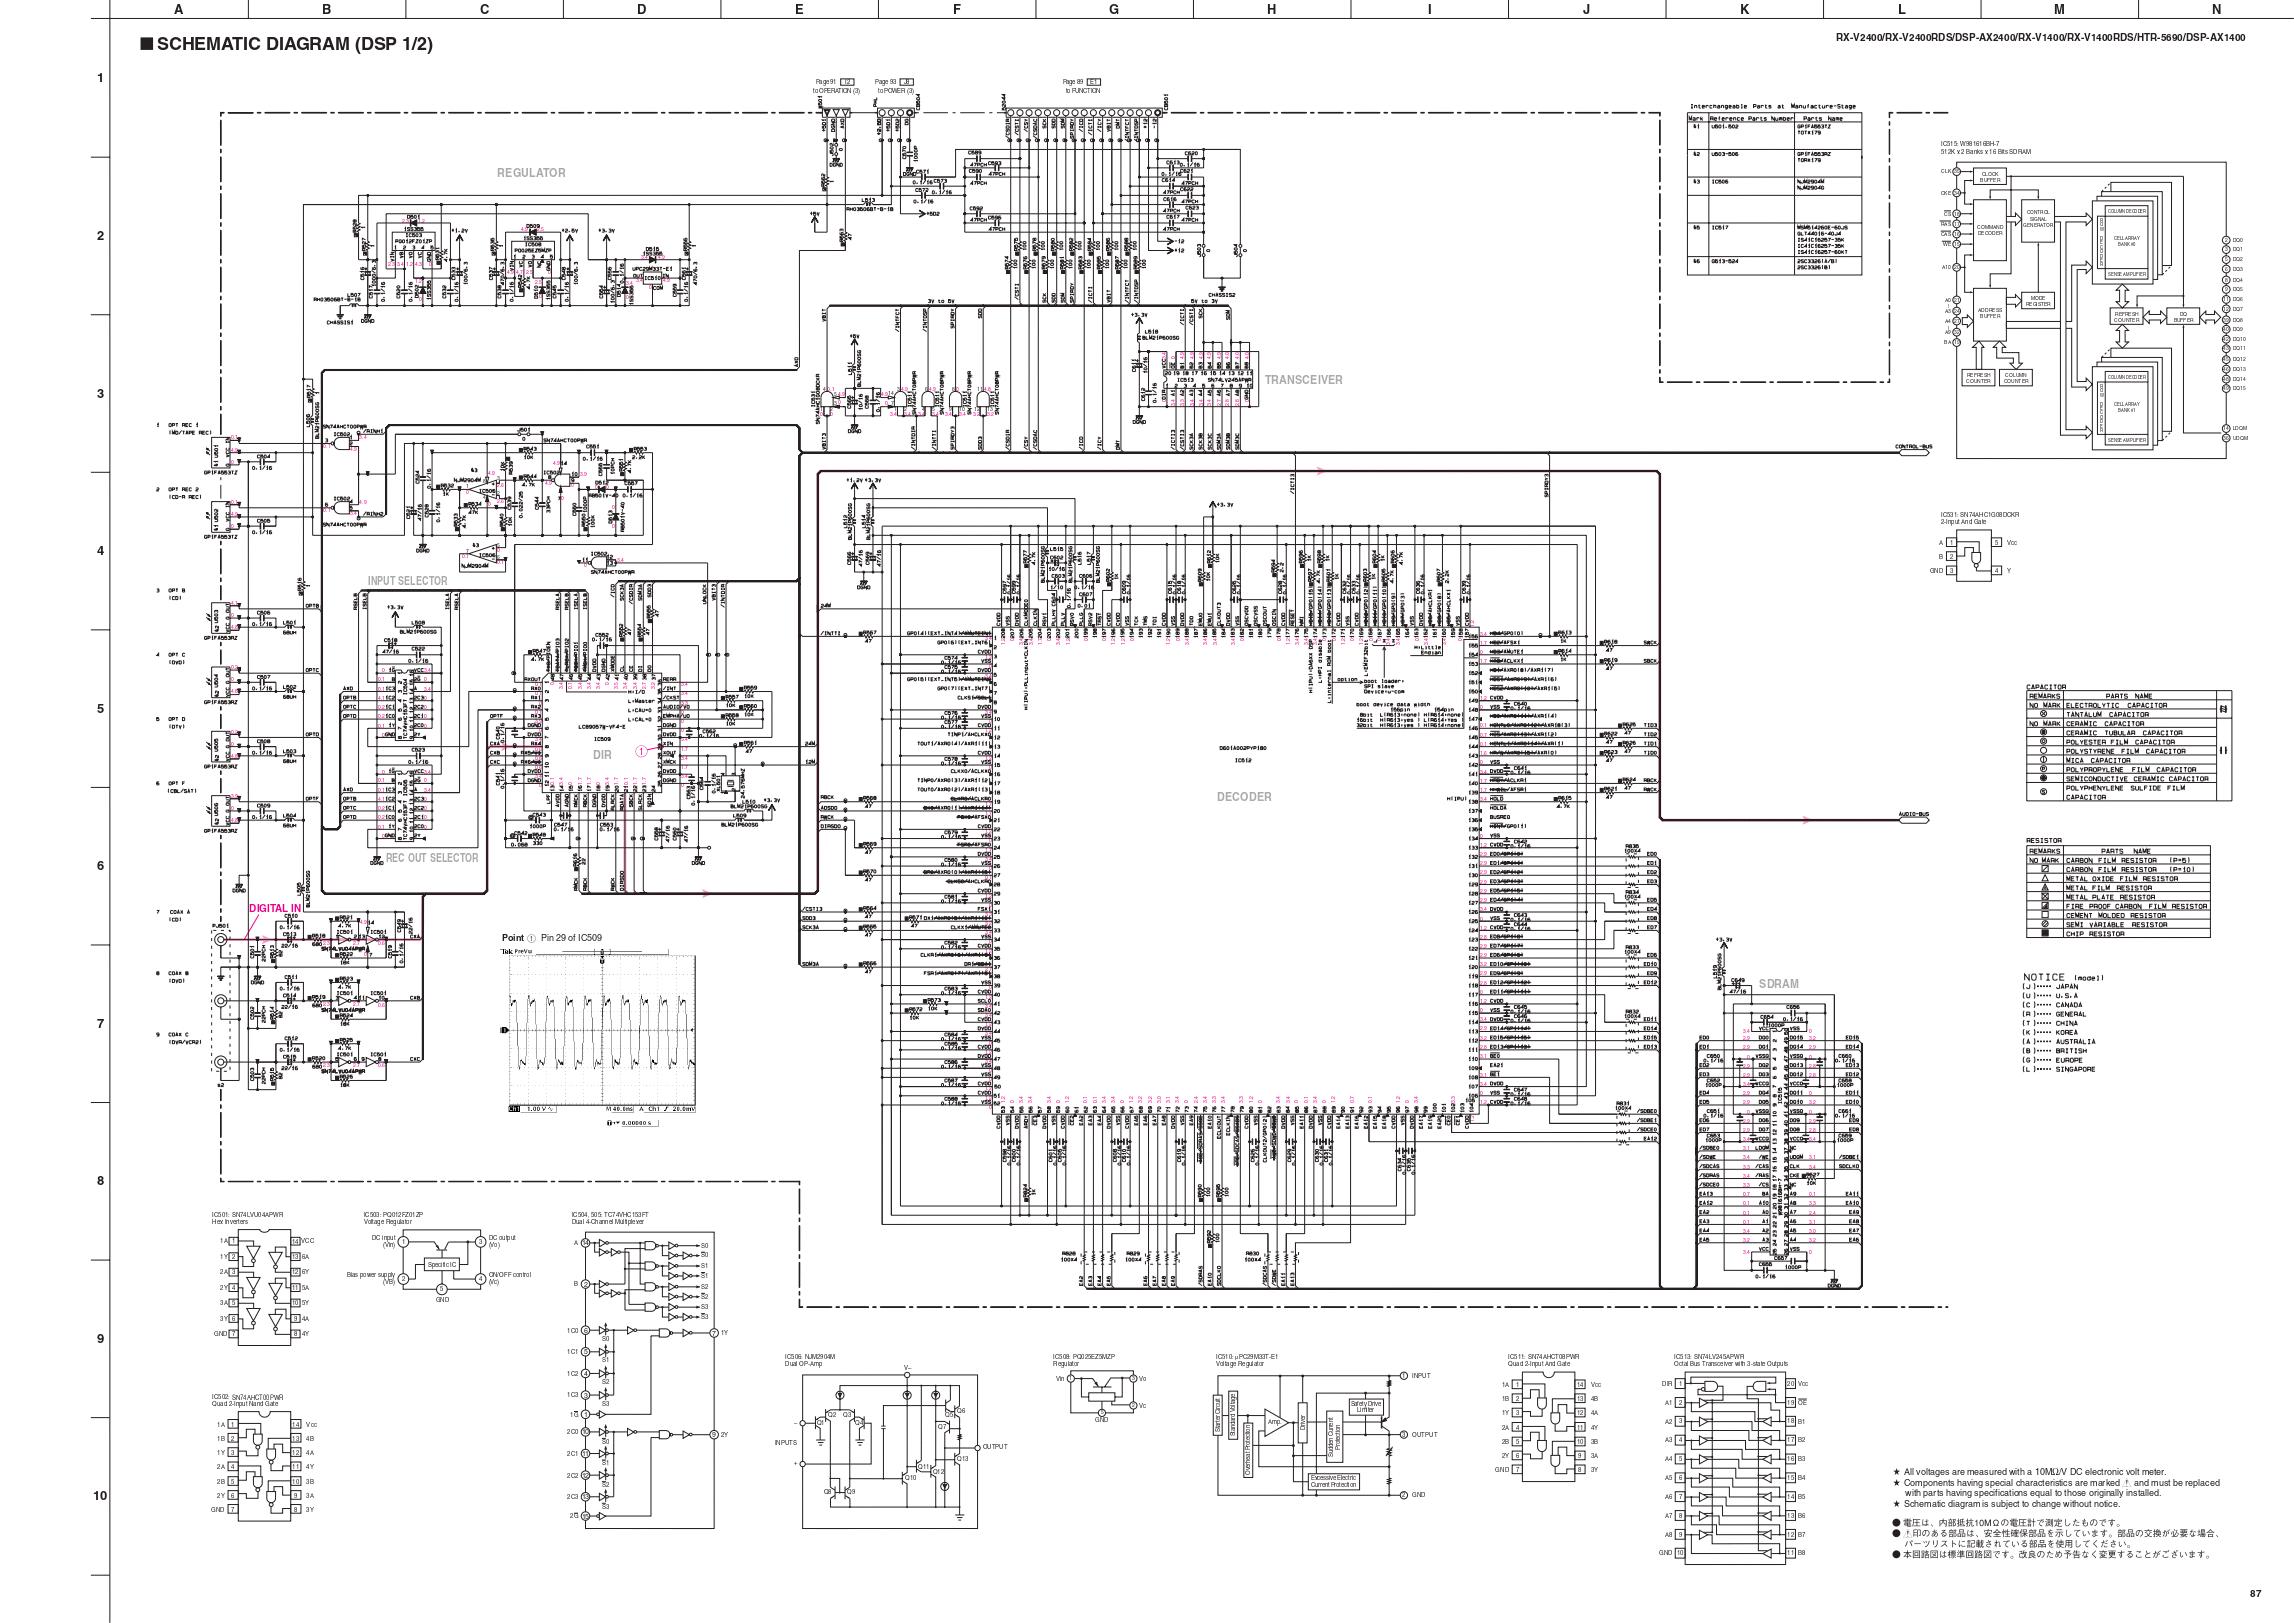 Yamaha雅马哈 HTR-5690 功放维修电路图纸